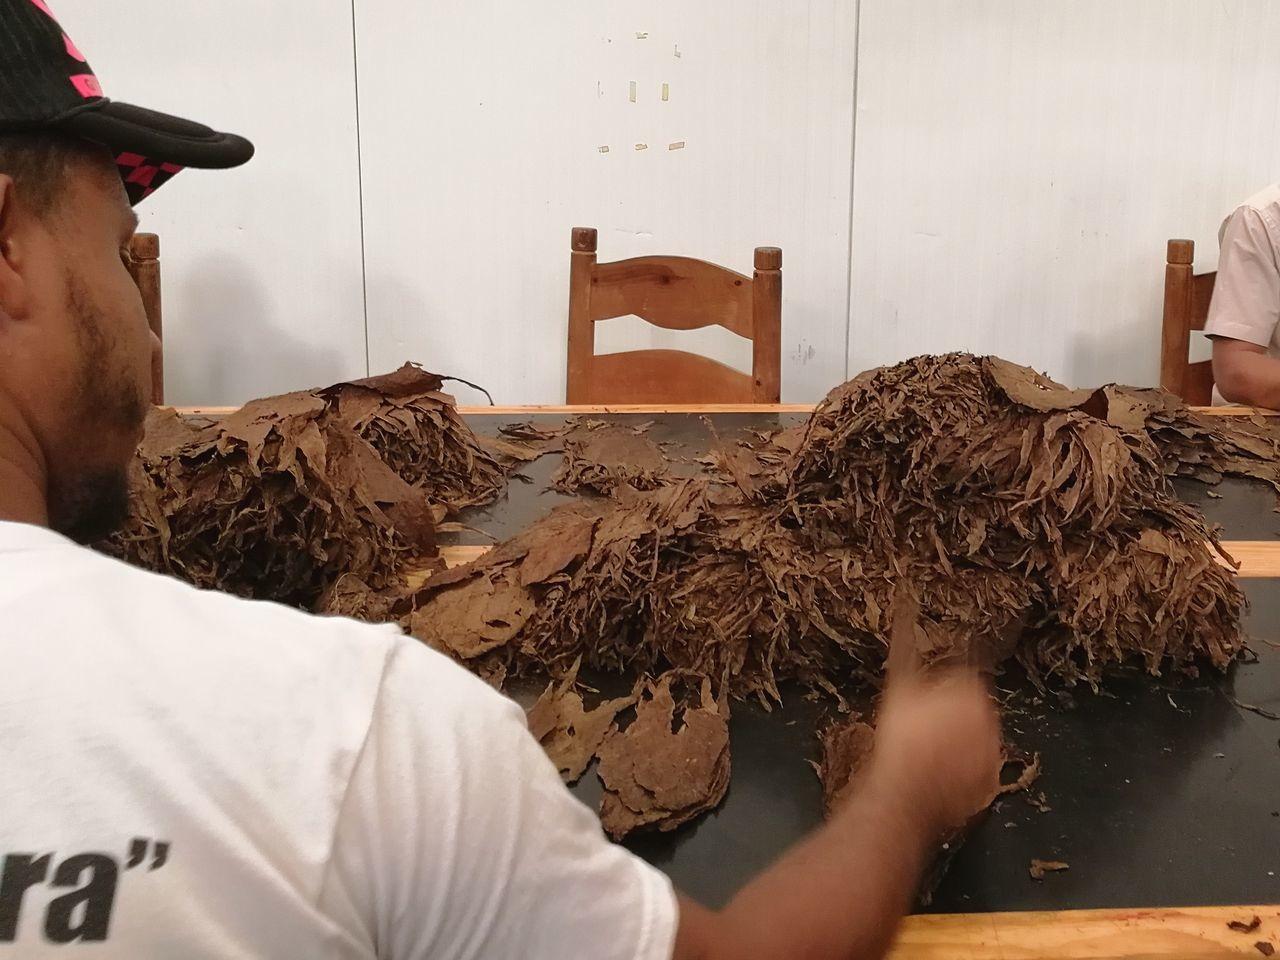 Republica Dominicana Dominican Republic Tobacco Cigars Making, Cigars Factory, Cigars República Dominicana. Tobacco Leaf Handcraft